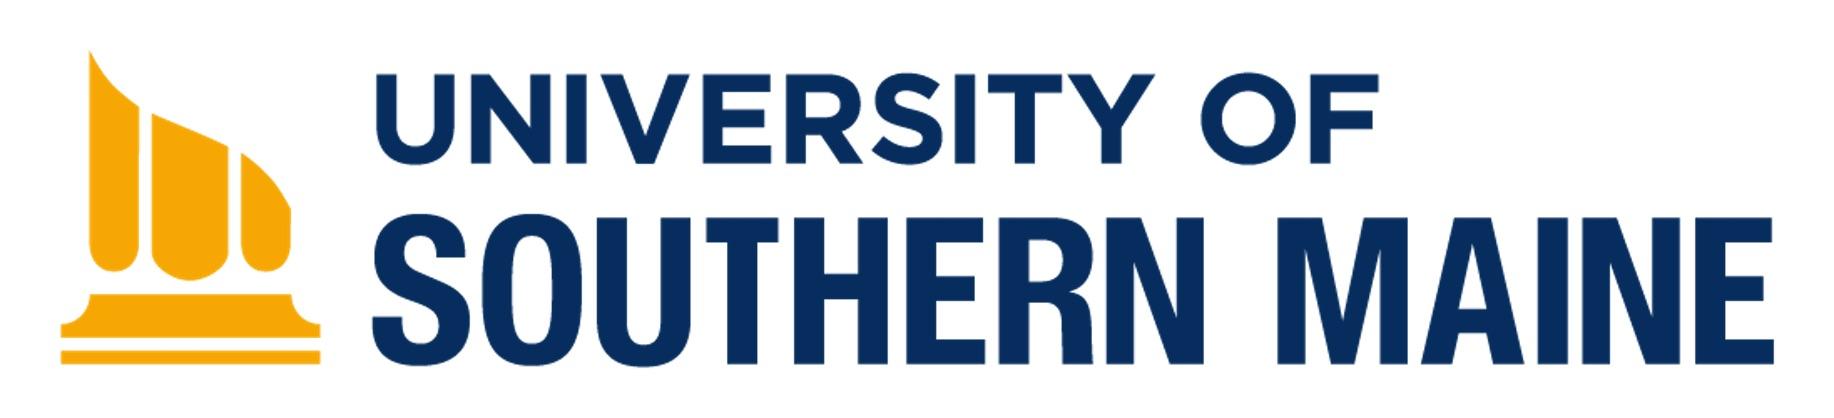 University_of_Southern_Maine_Classic_Logo.jpg